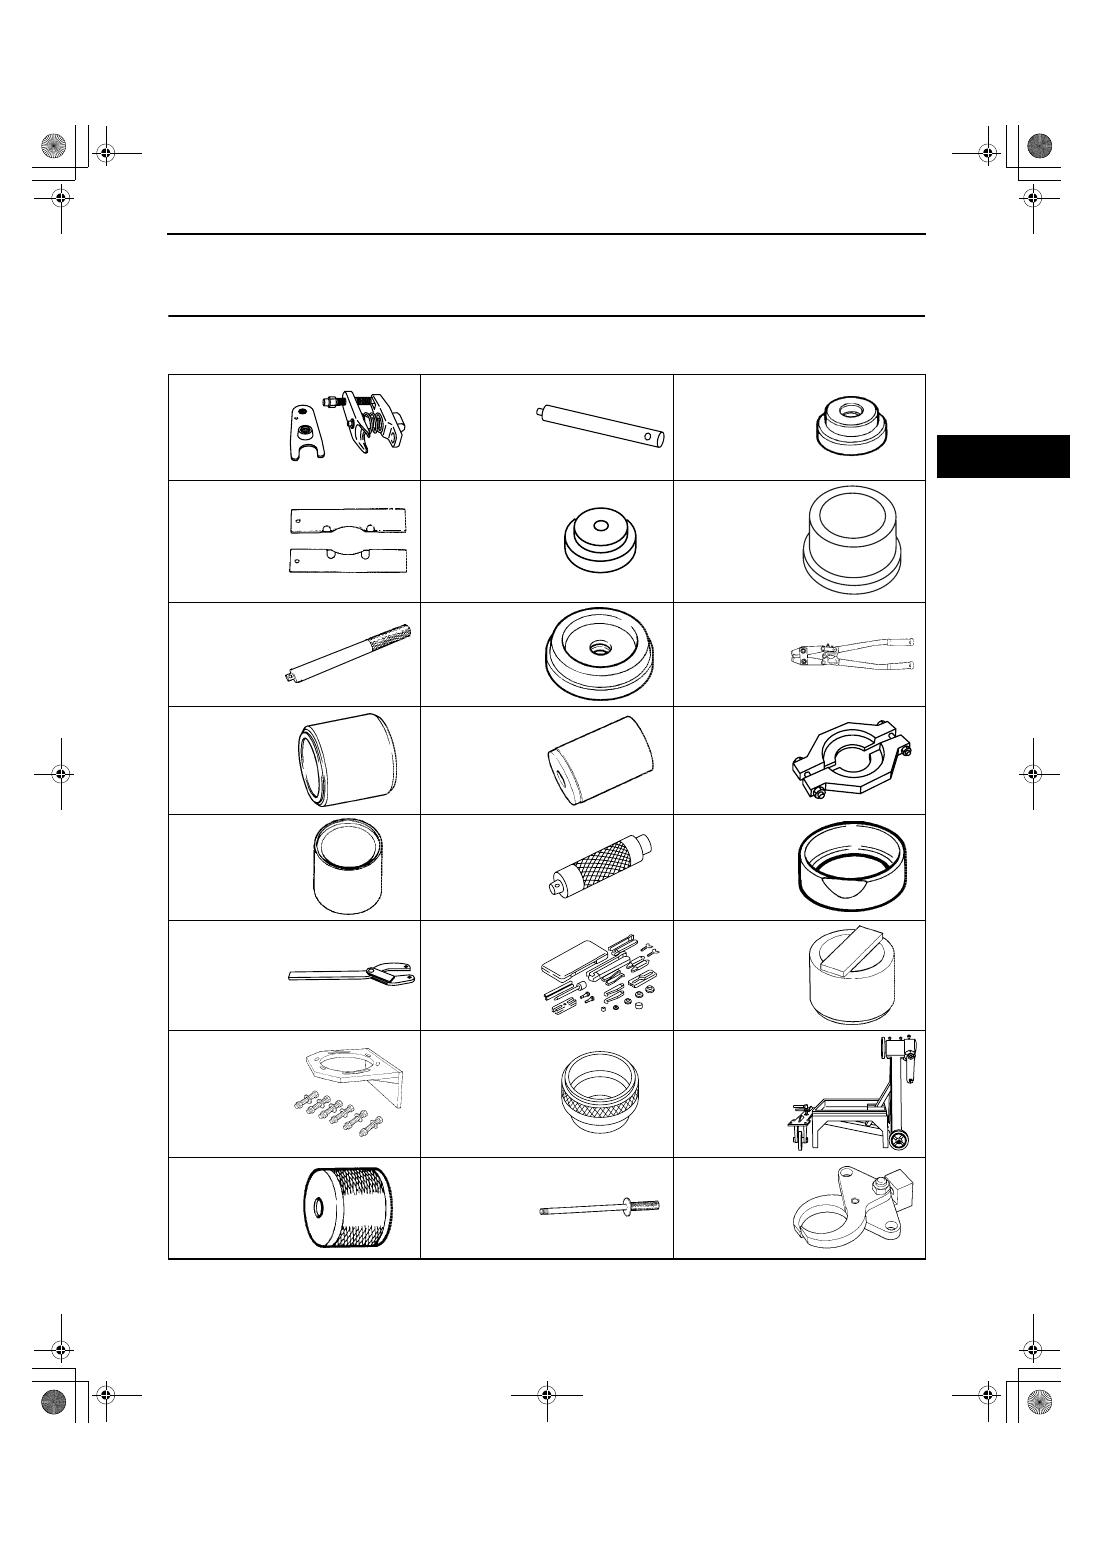 Mazda 3 Service Manual: General Procedures (Brake)